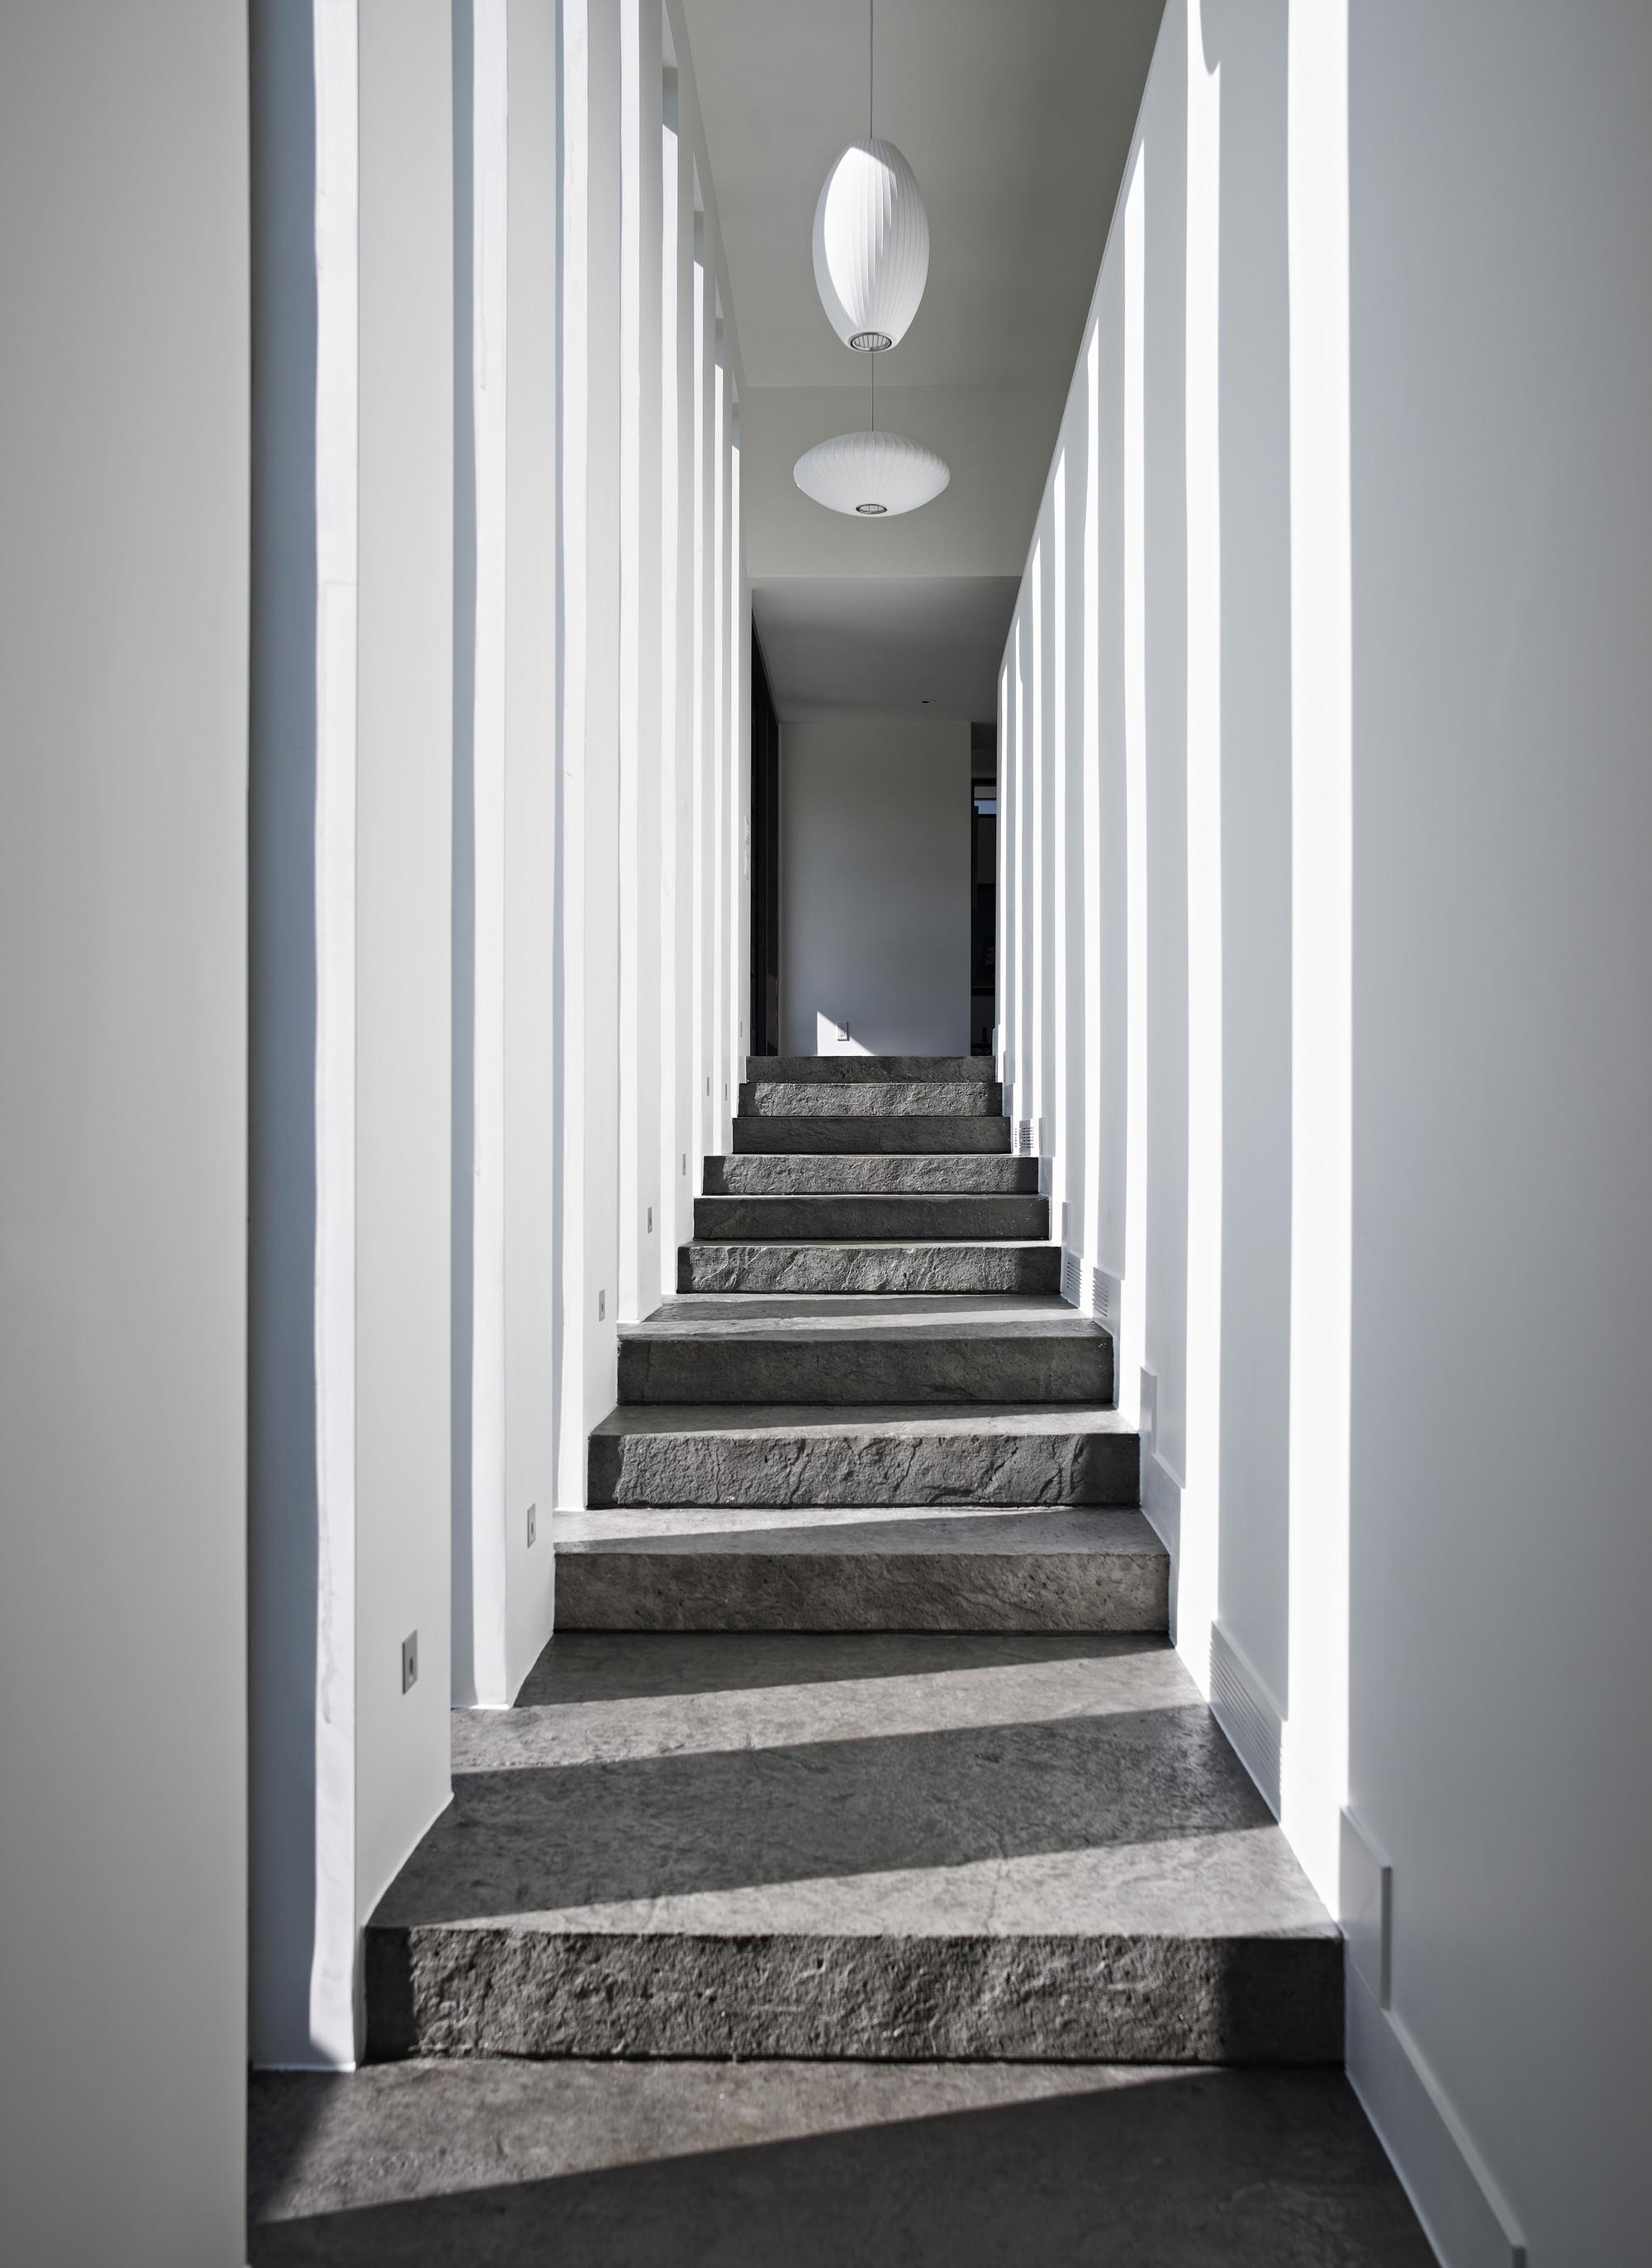 Galer a de casa clearview altius architecture inc 2 for 4 1 architecture view